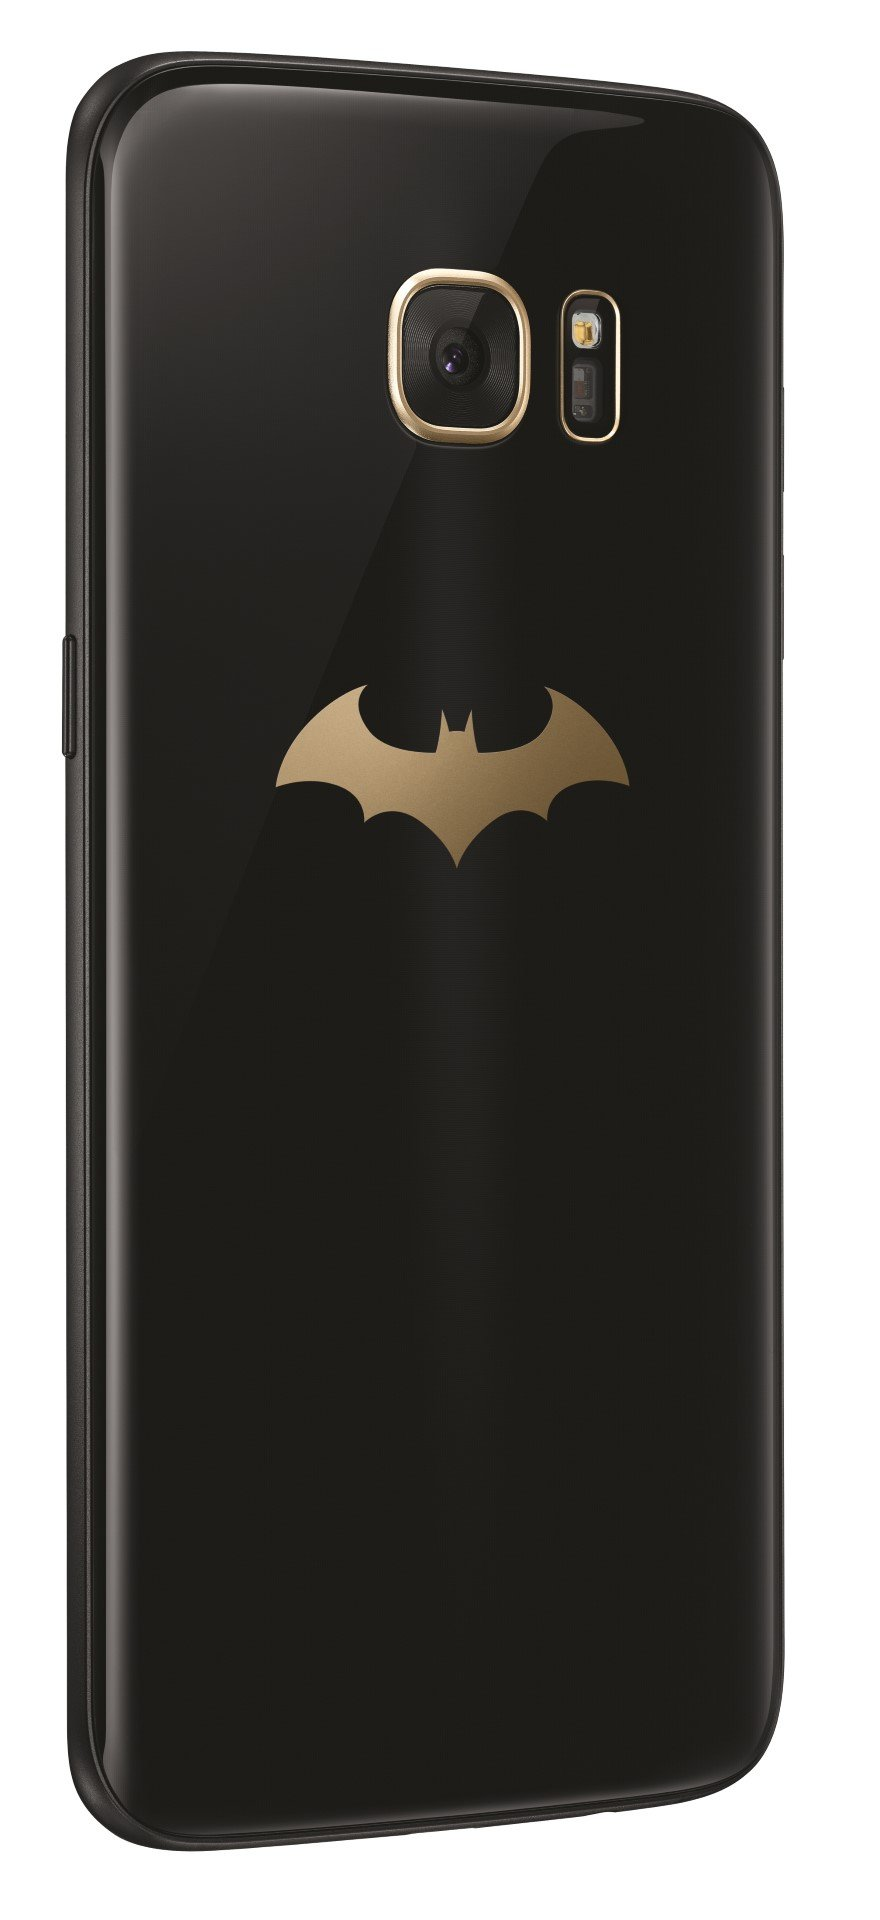 Samsung Galaxy S7 Edge - Batman Edition soll kommen 4